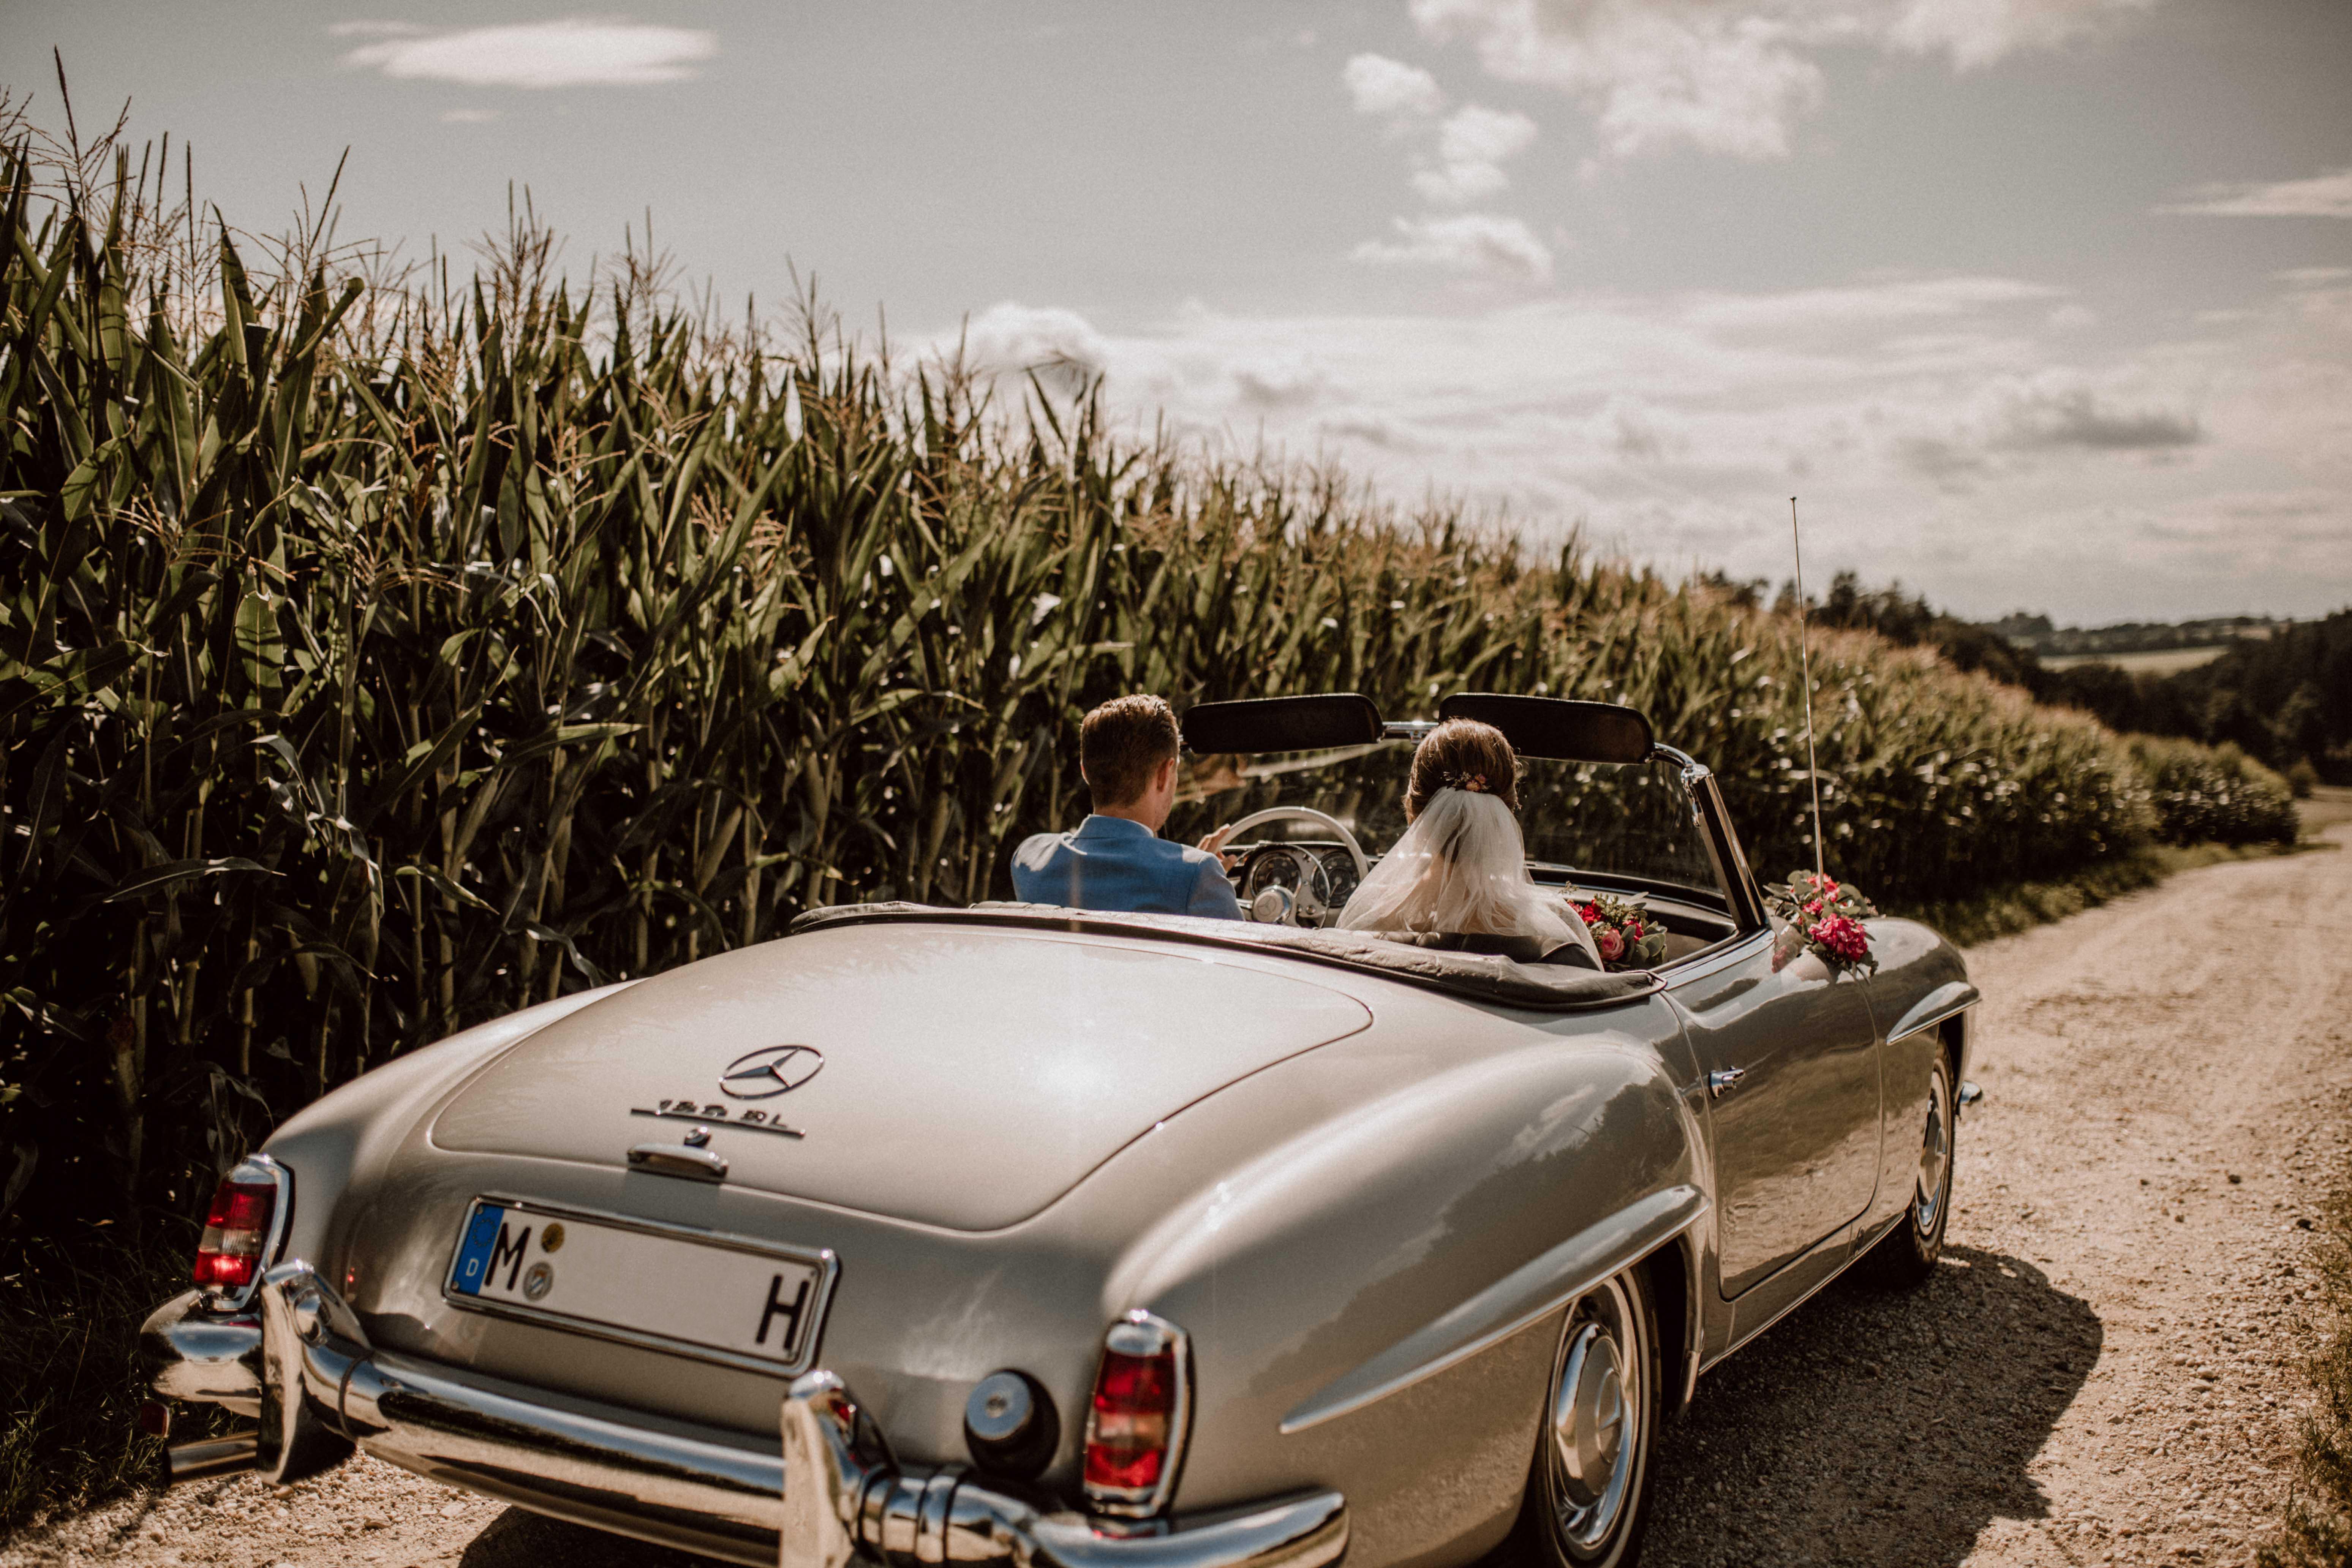 abenteuer feldweg sonja poehlmann photography couples muenchen bayern